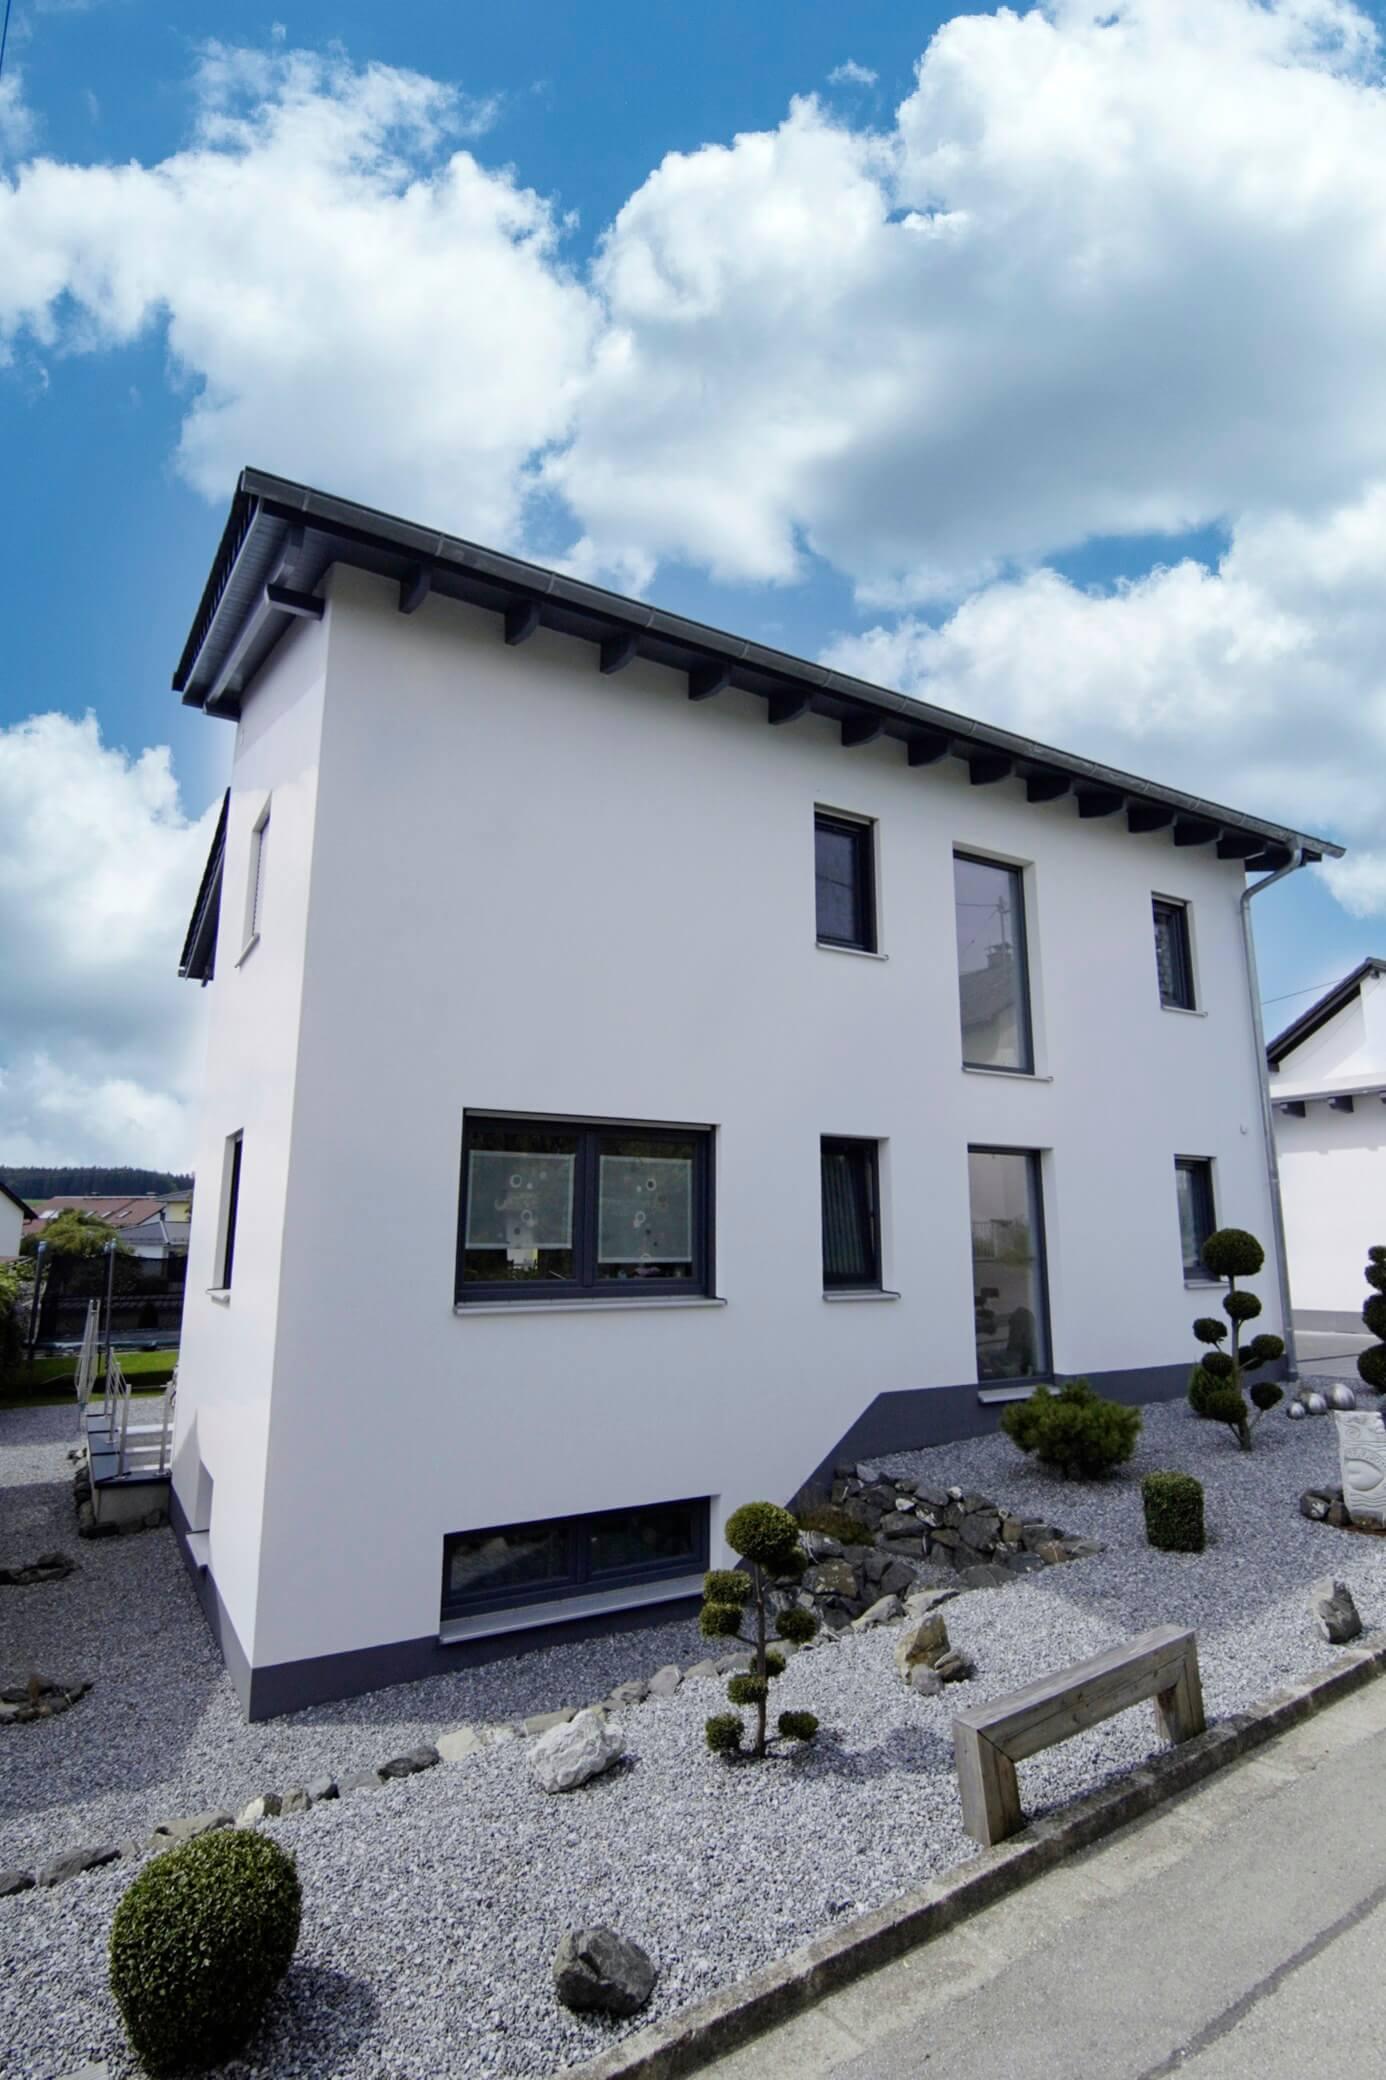 K&K Bau GmbH Massivhaus Referenzbild 19